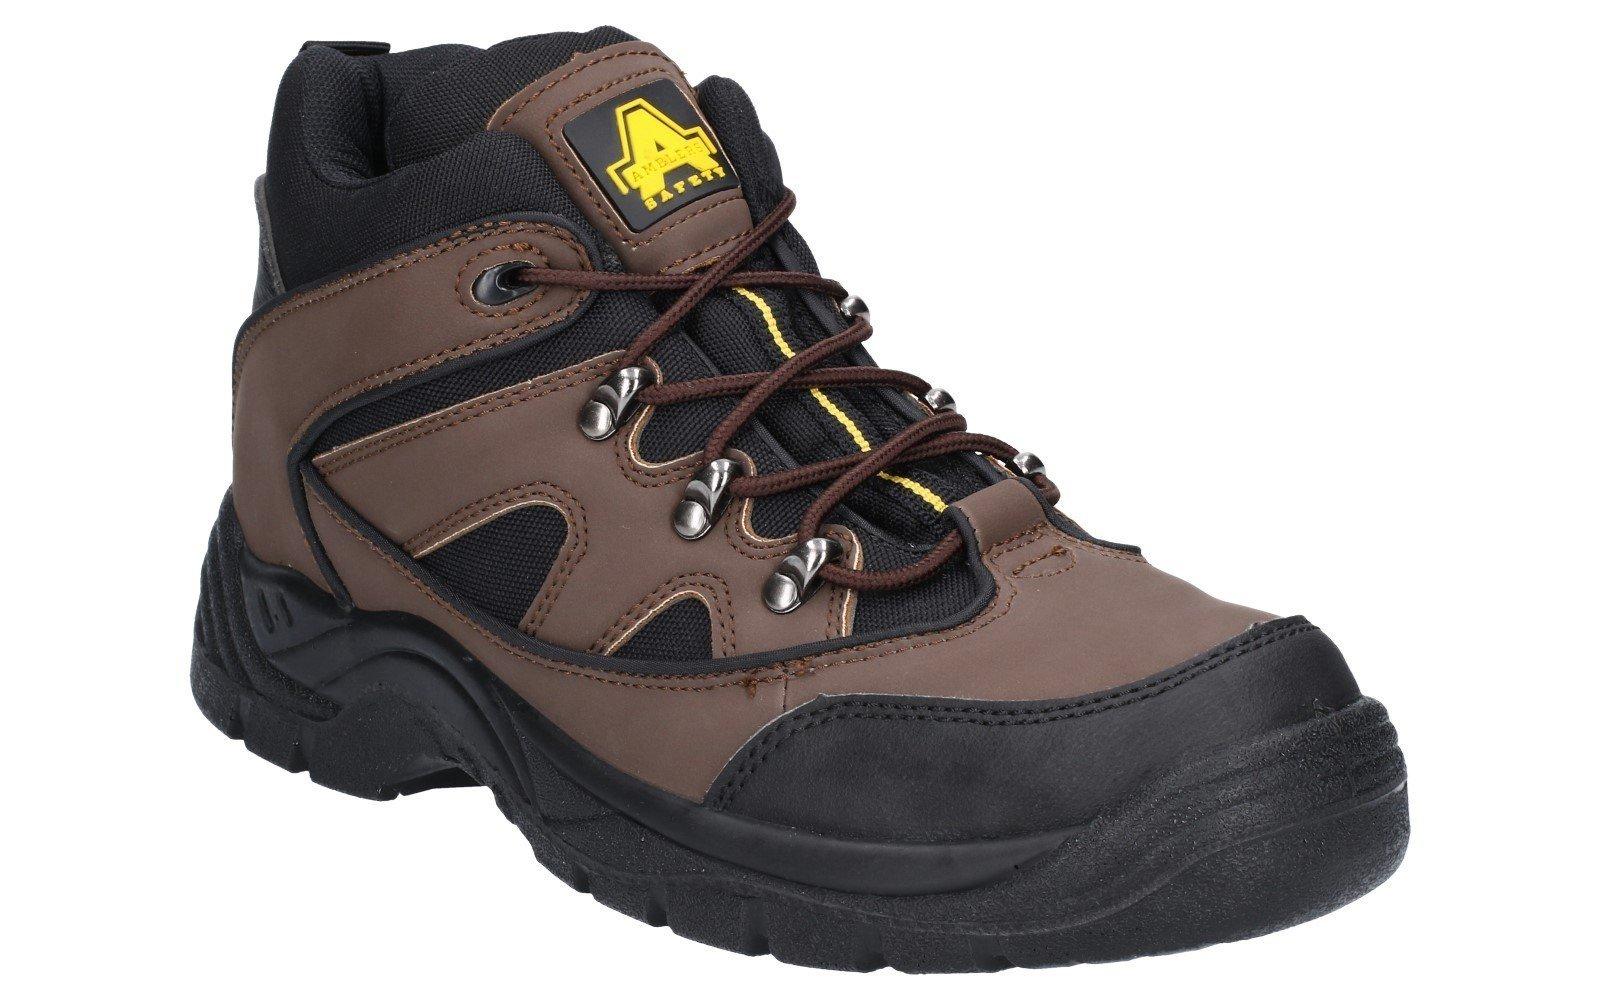 Amblers Unisex Safety Vegan Friendly Boot Brown 16170 - Brown 4